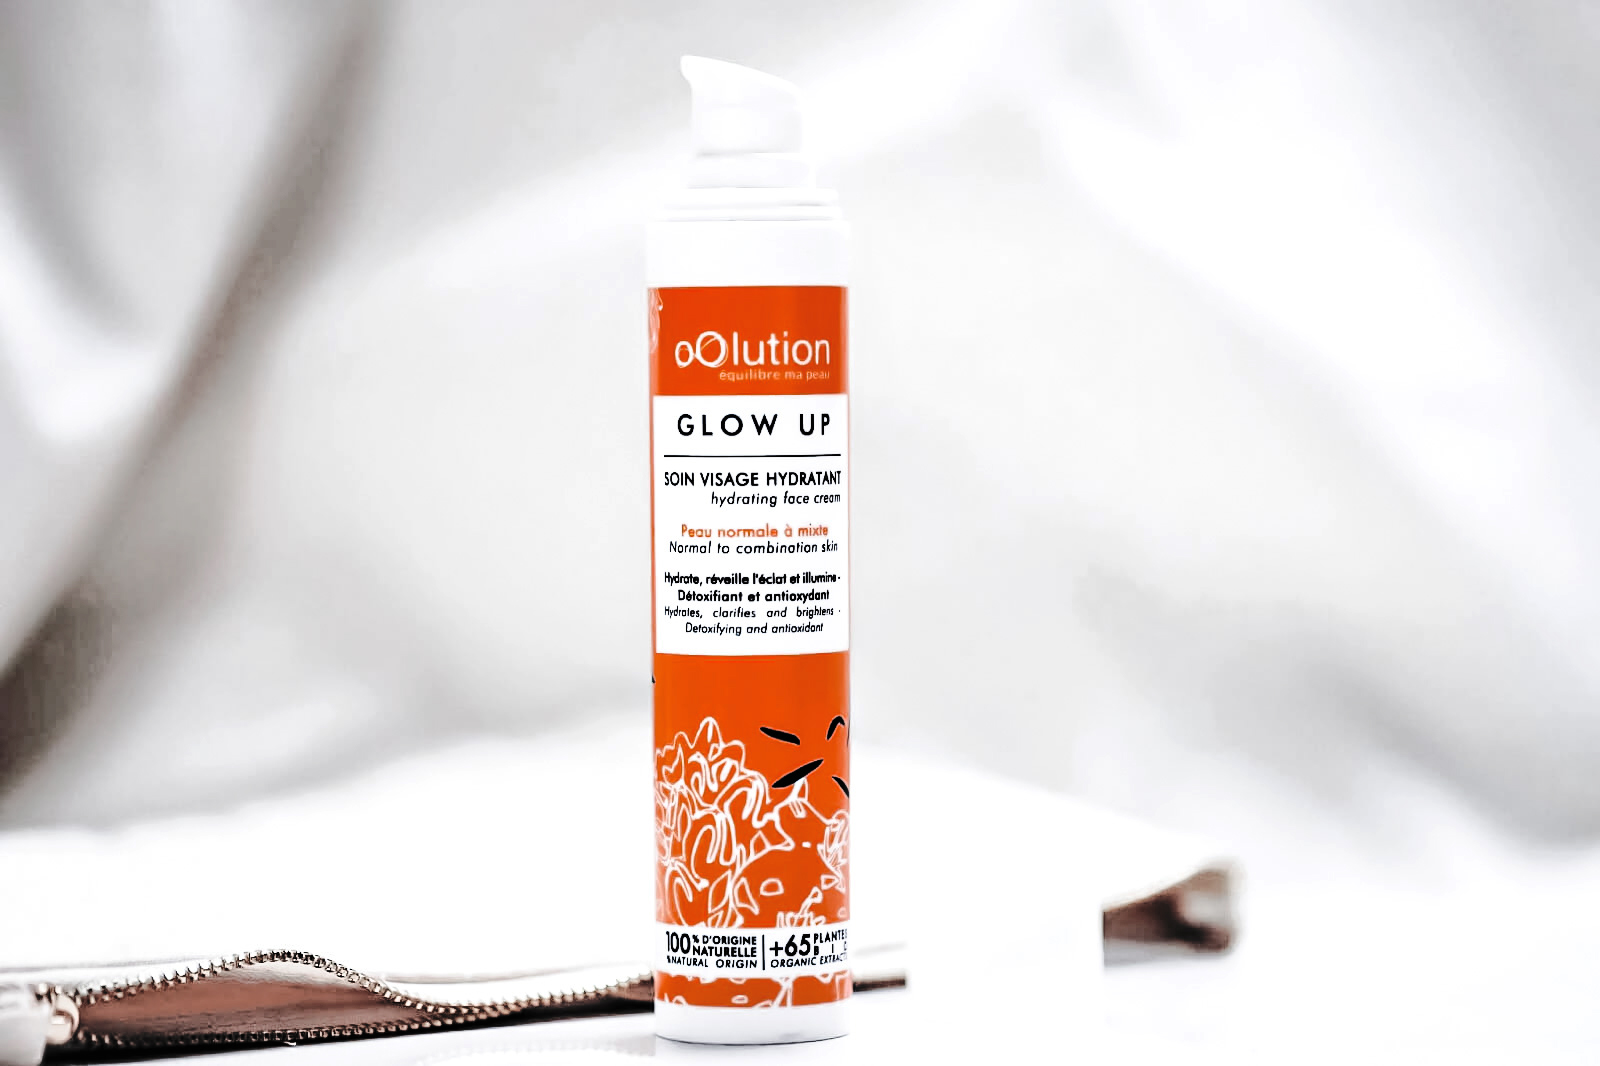 Oolution Soin Hydratant Avis